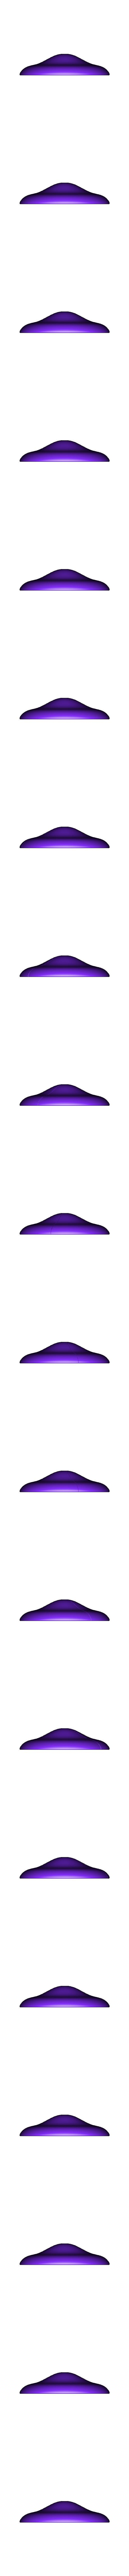 Top.stl Download OBJ file Mickey Christmas night light lithophane • 3D printing model, Ludo3D